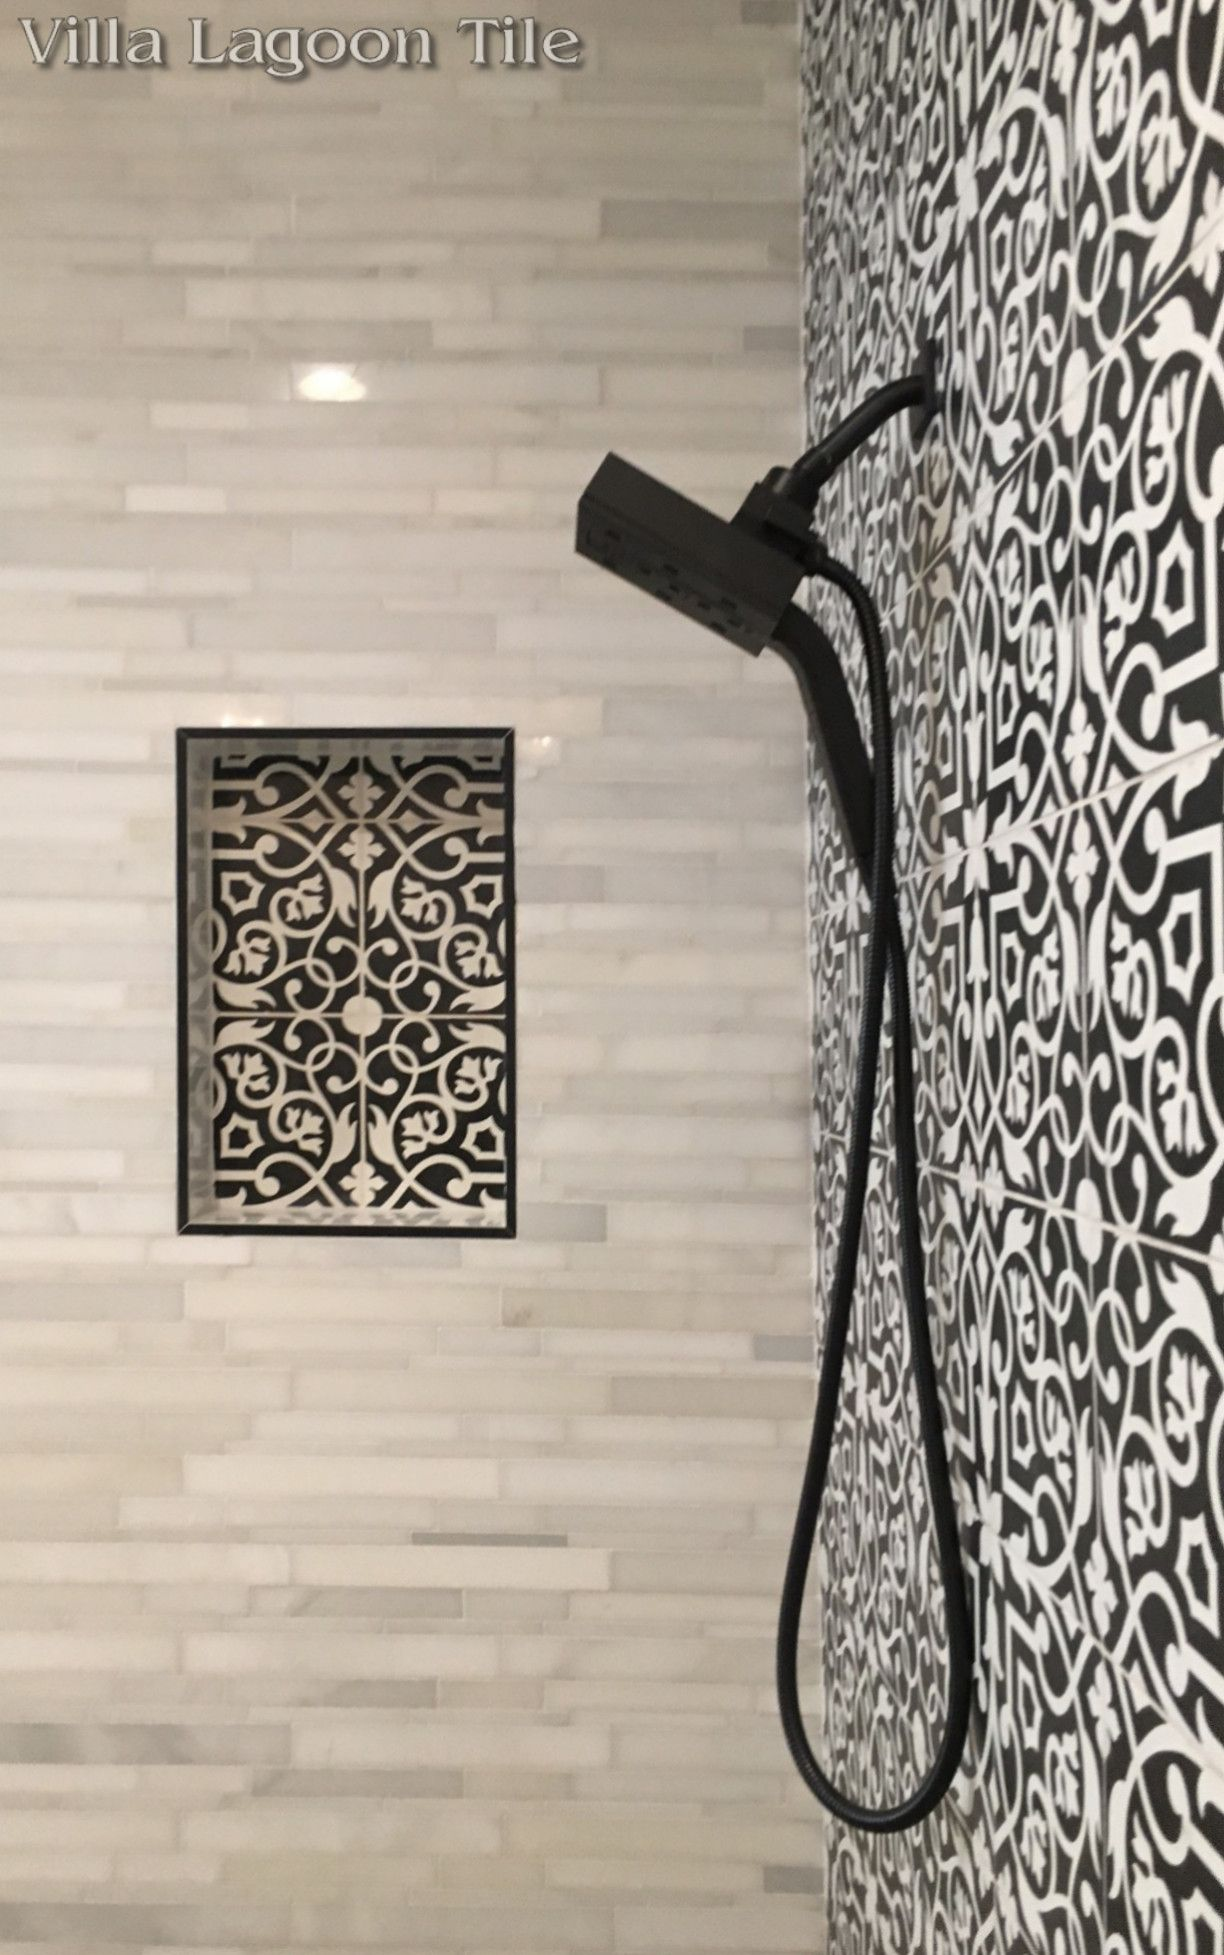 Villa Lagoon Tile 39 S Exclusive In Stock Gypsy Black